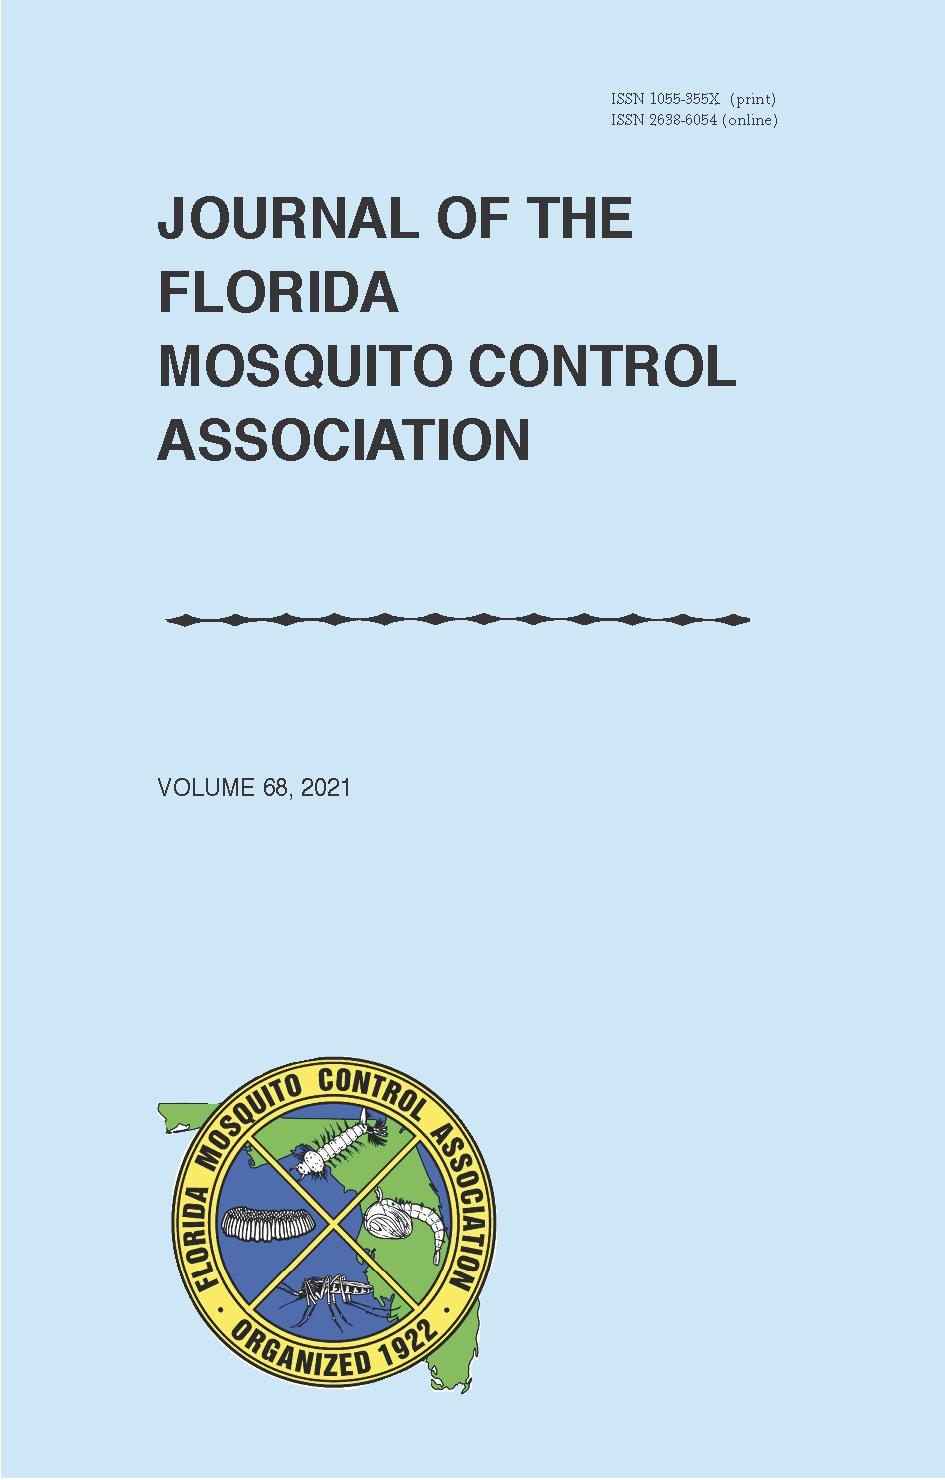 View Vol. 68 No. 1 (2021): Journal of the Florida Mosquito Control Association